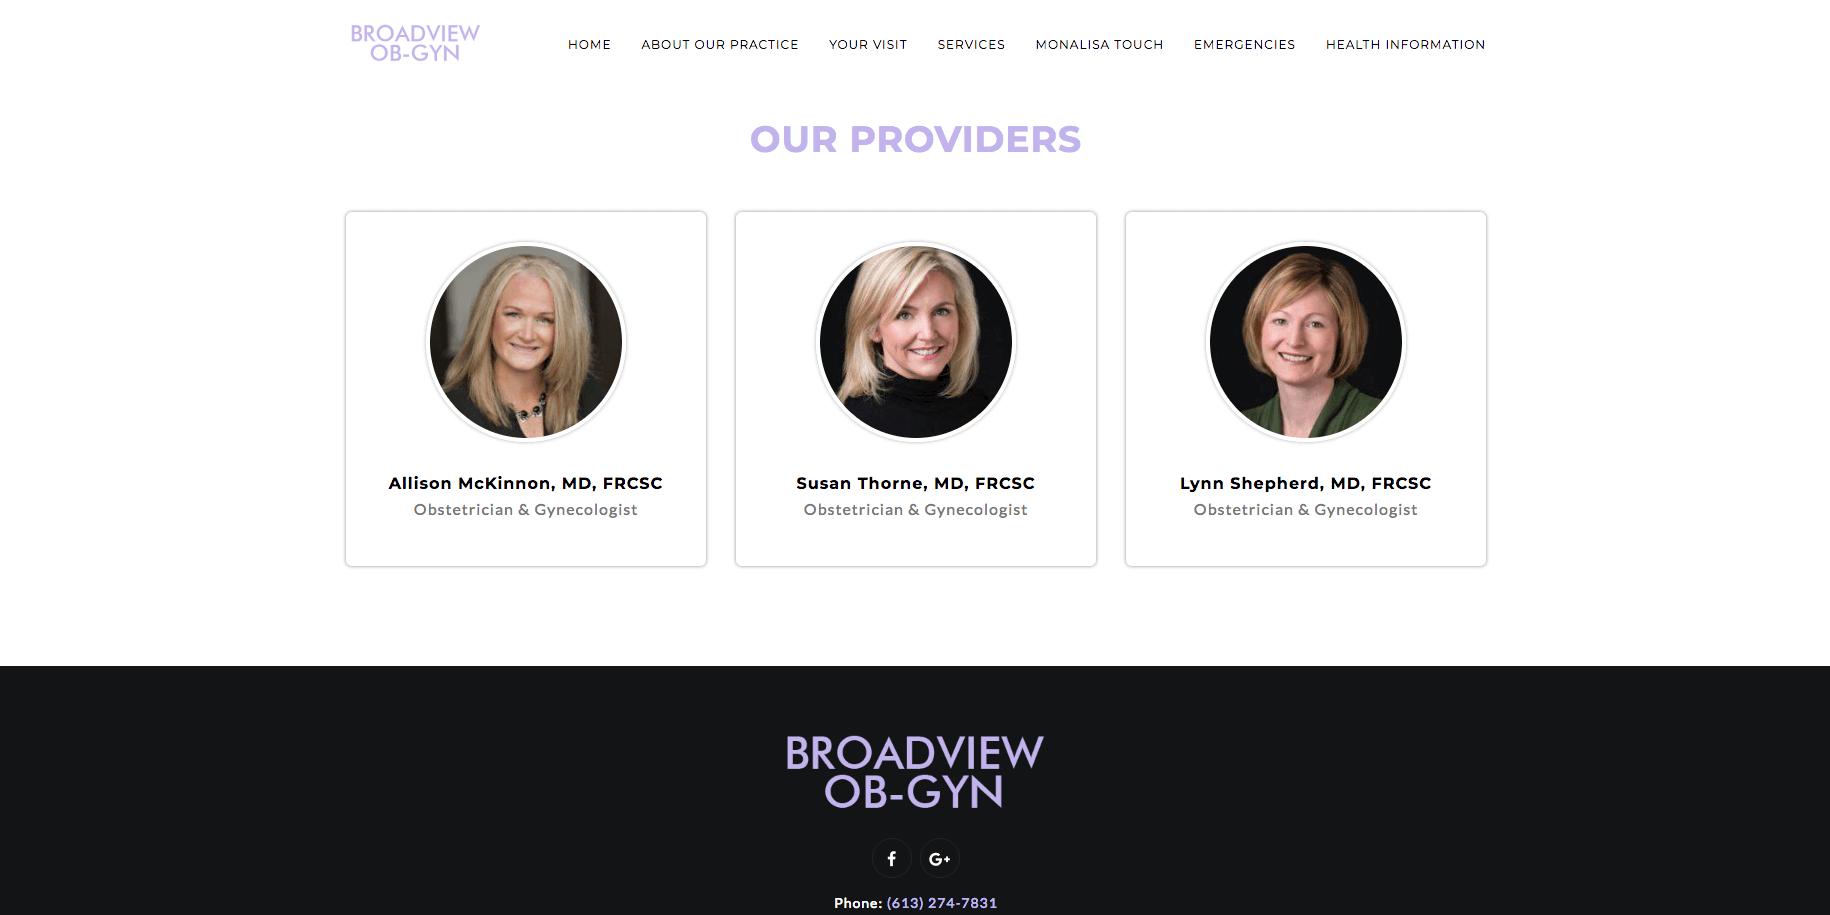 Broadview OB-GYN